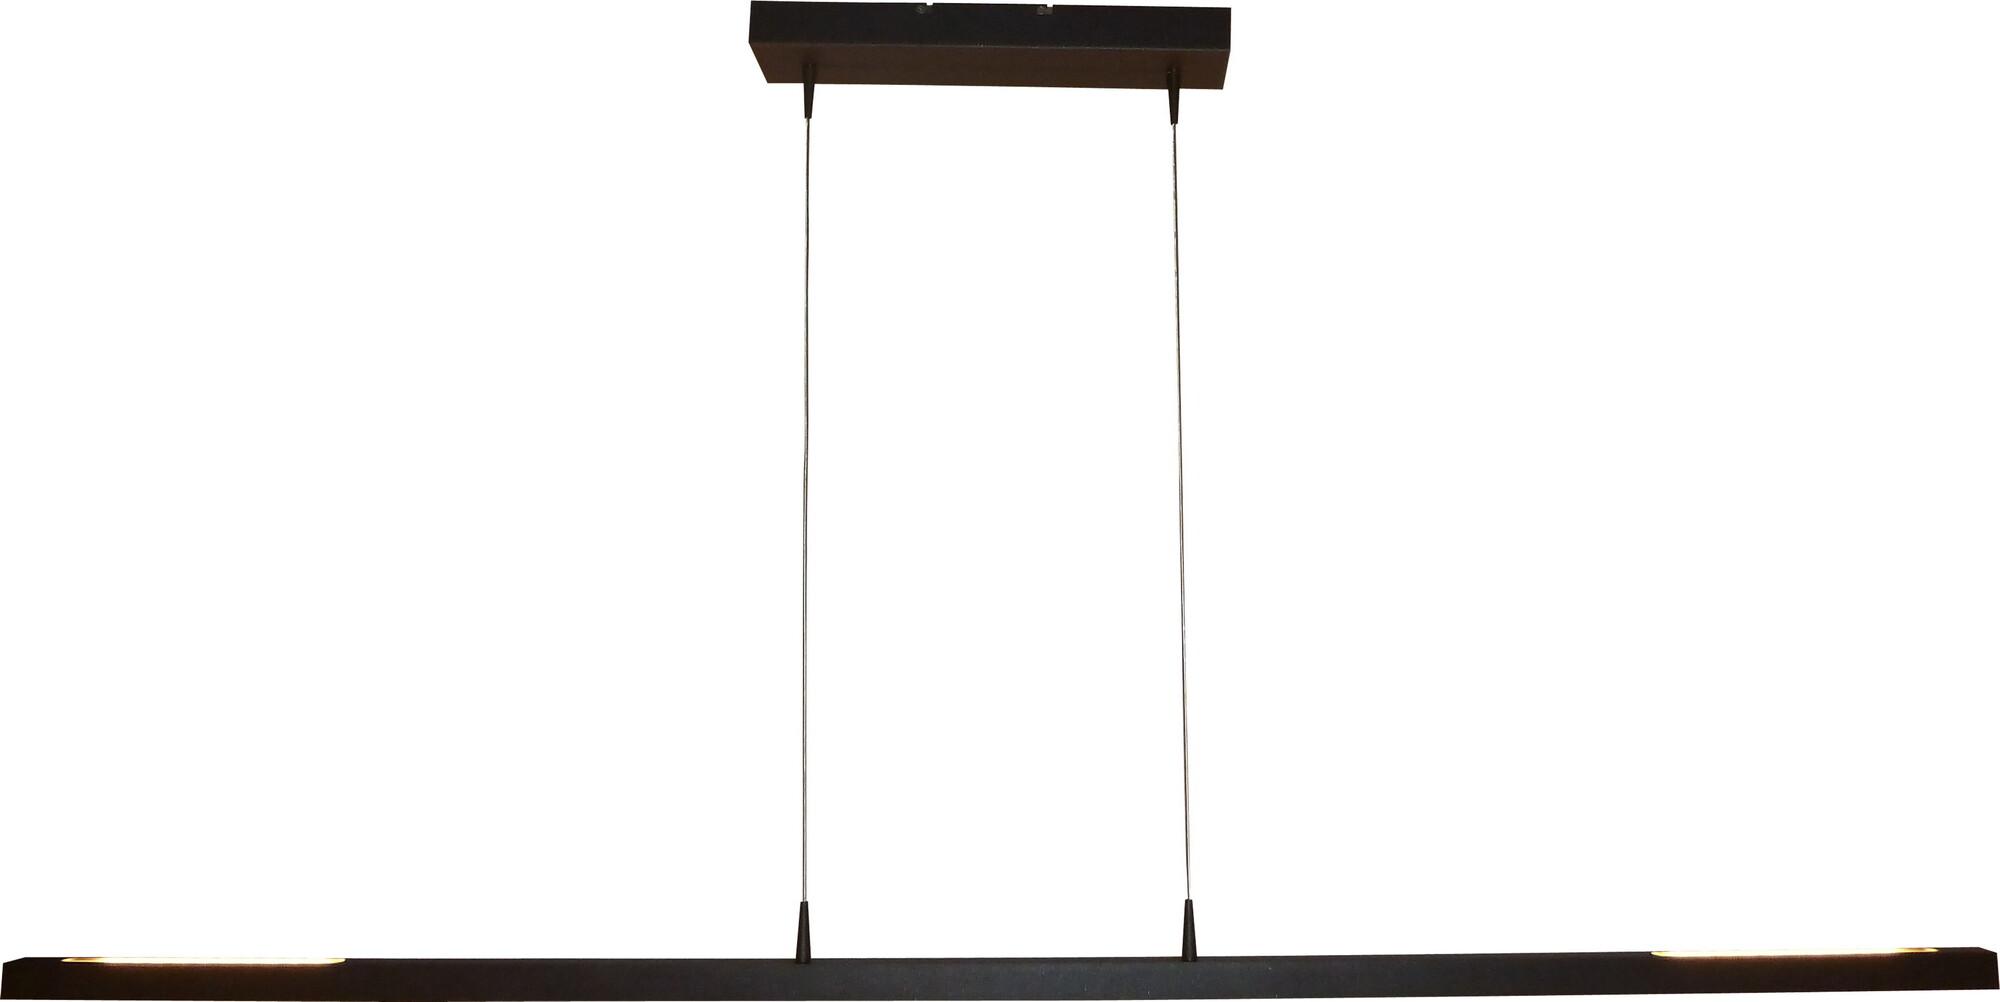 REAL Hanglamp LED 1x40W/5700lm Zwart